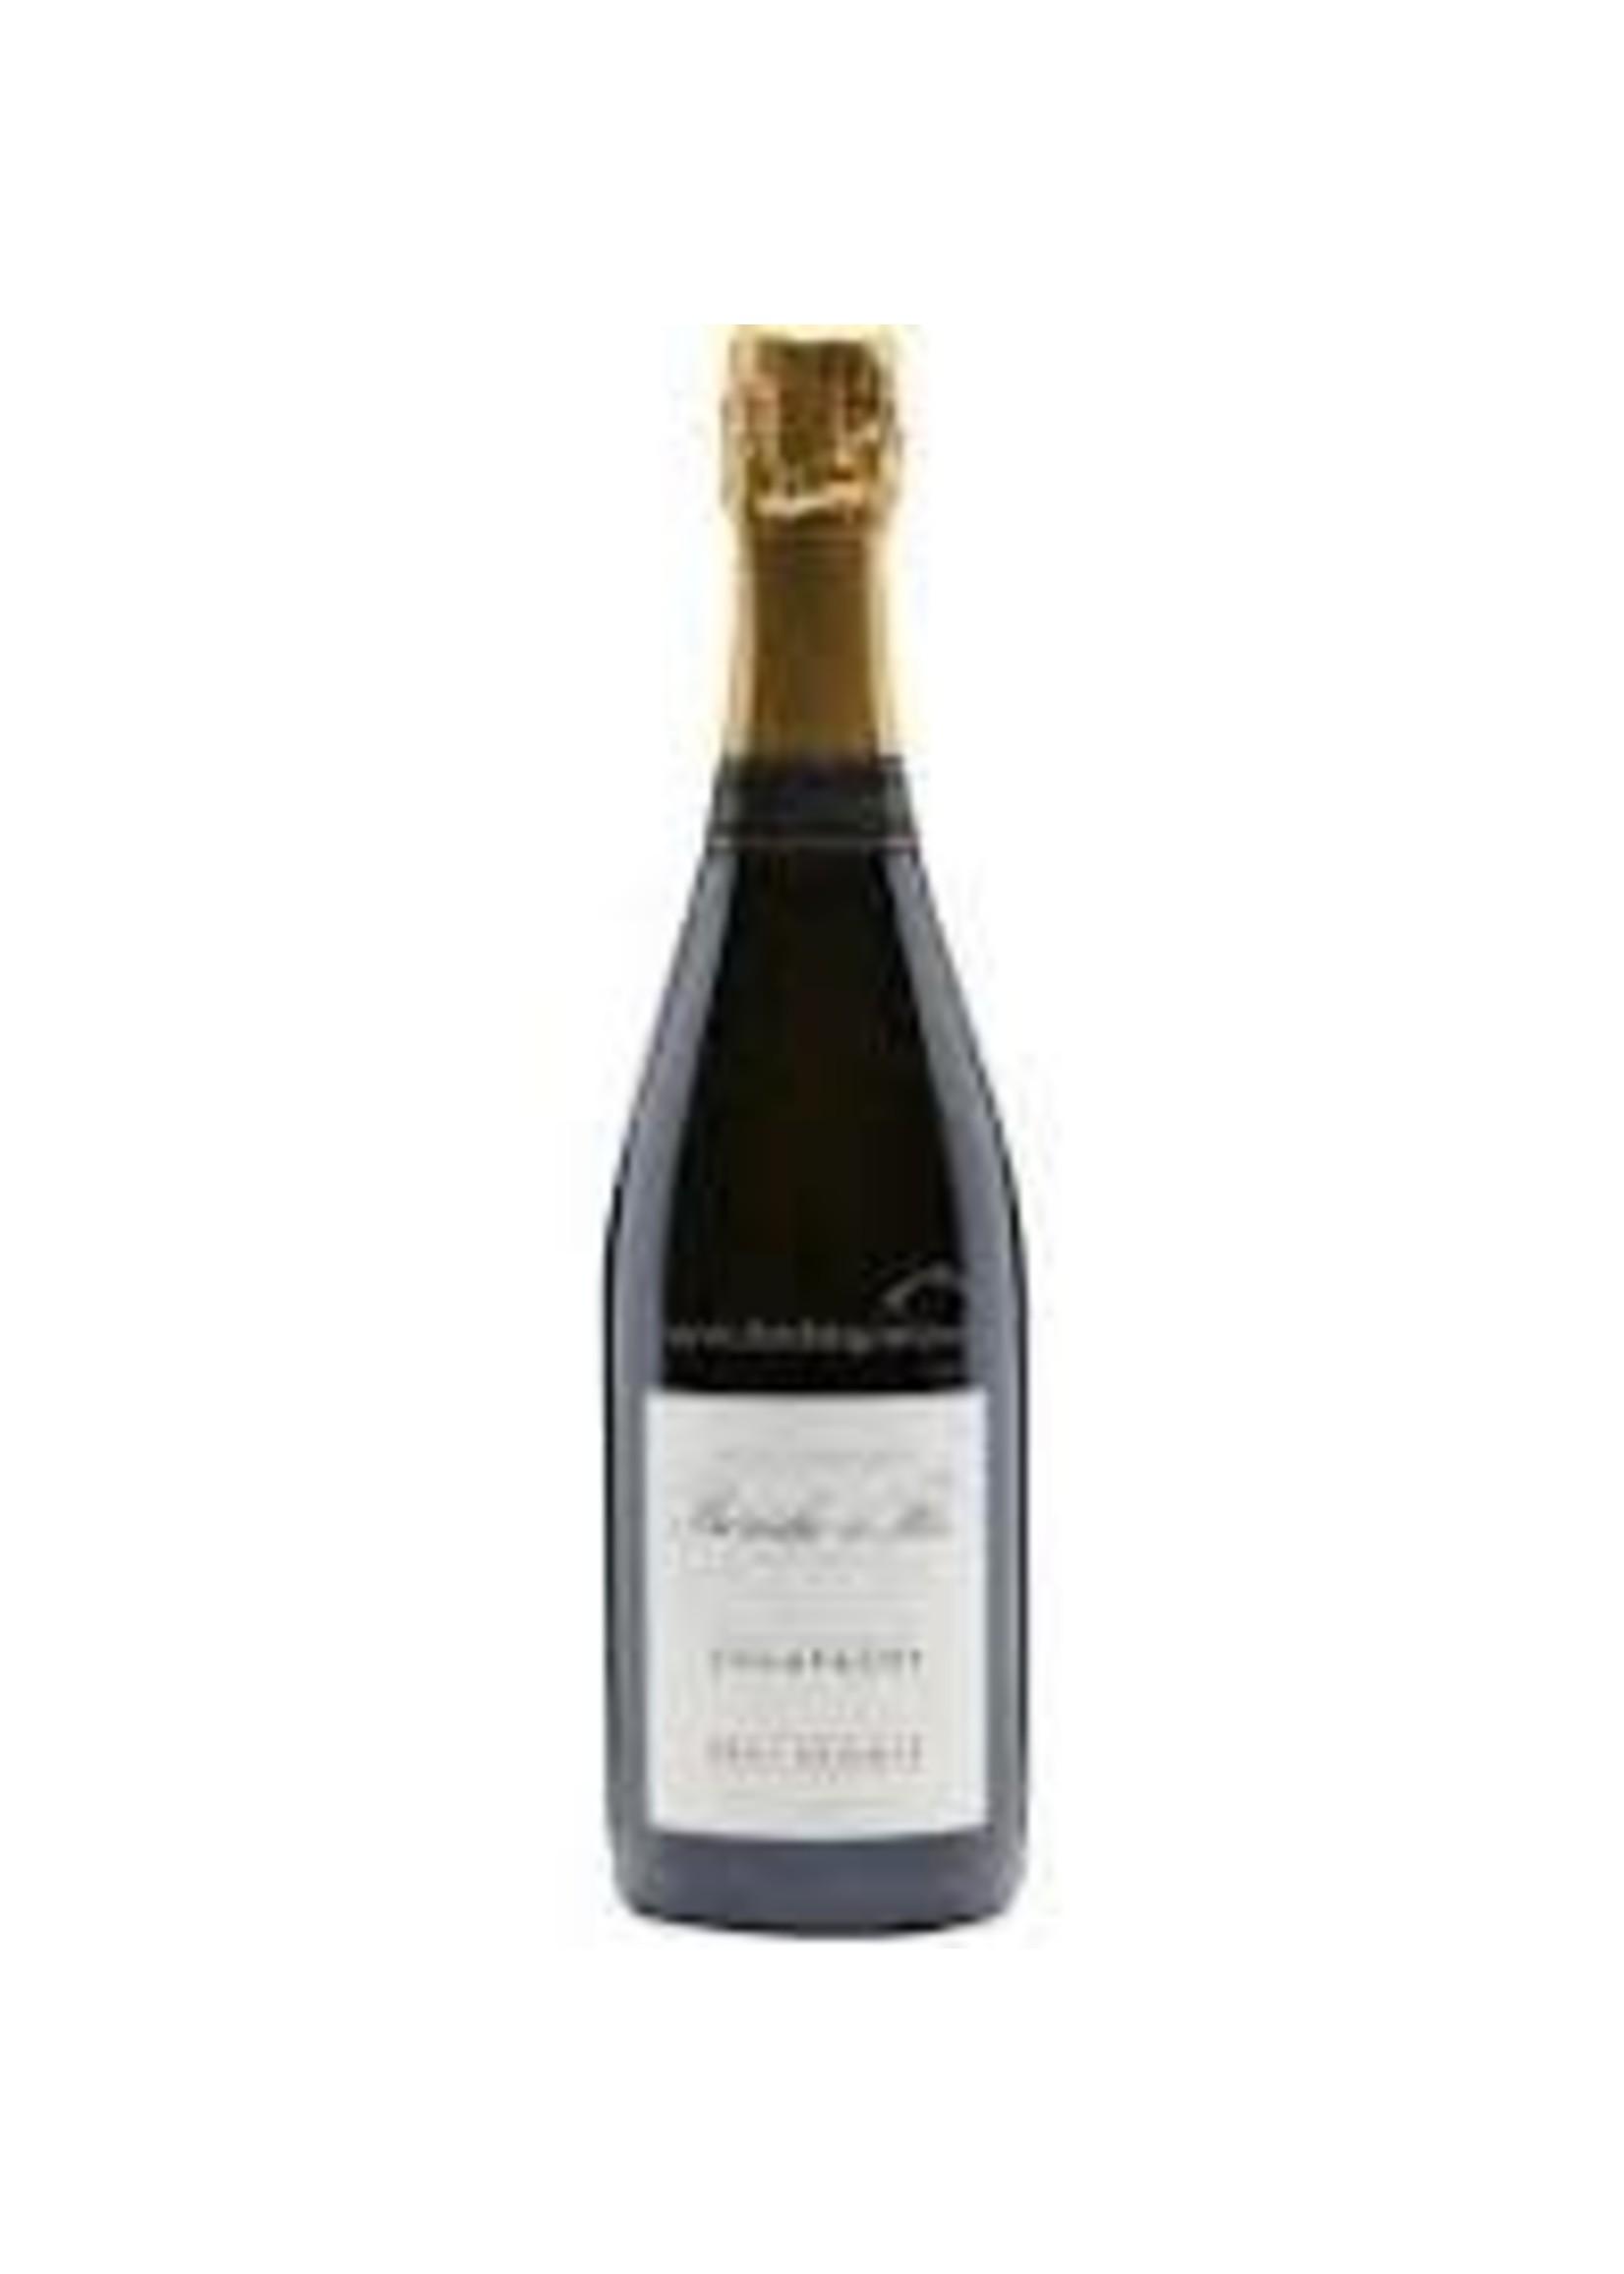 Bereche NV Champagne Brut Reserve Vieilles Vignes 750ml